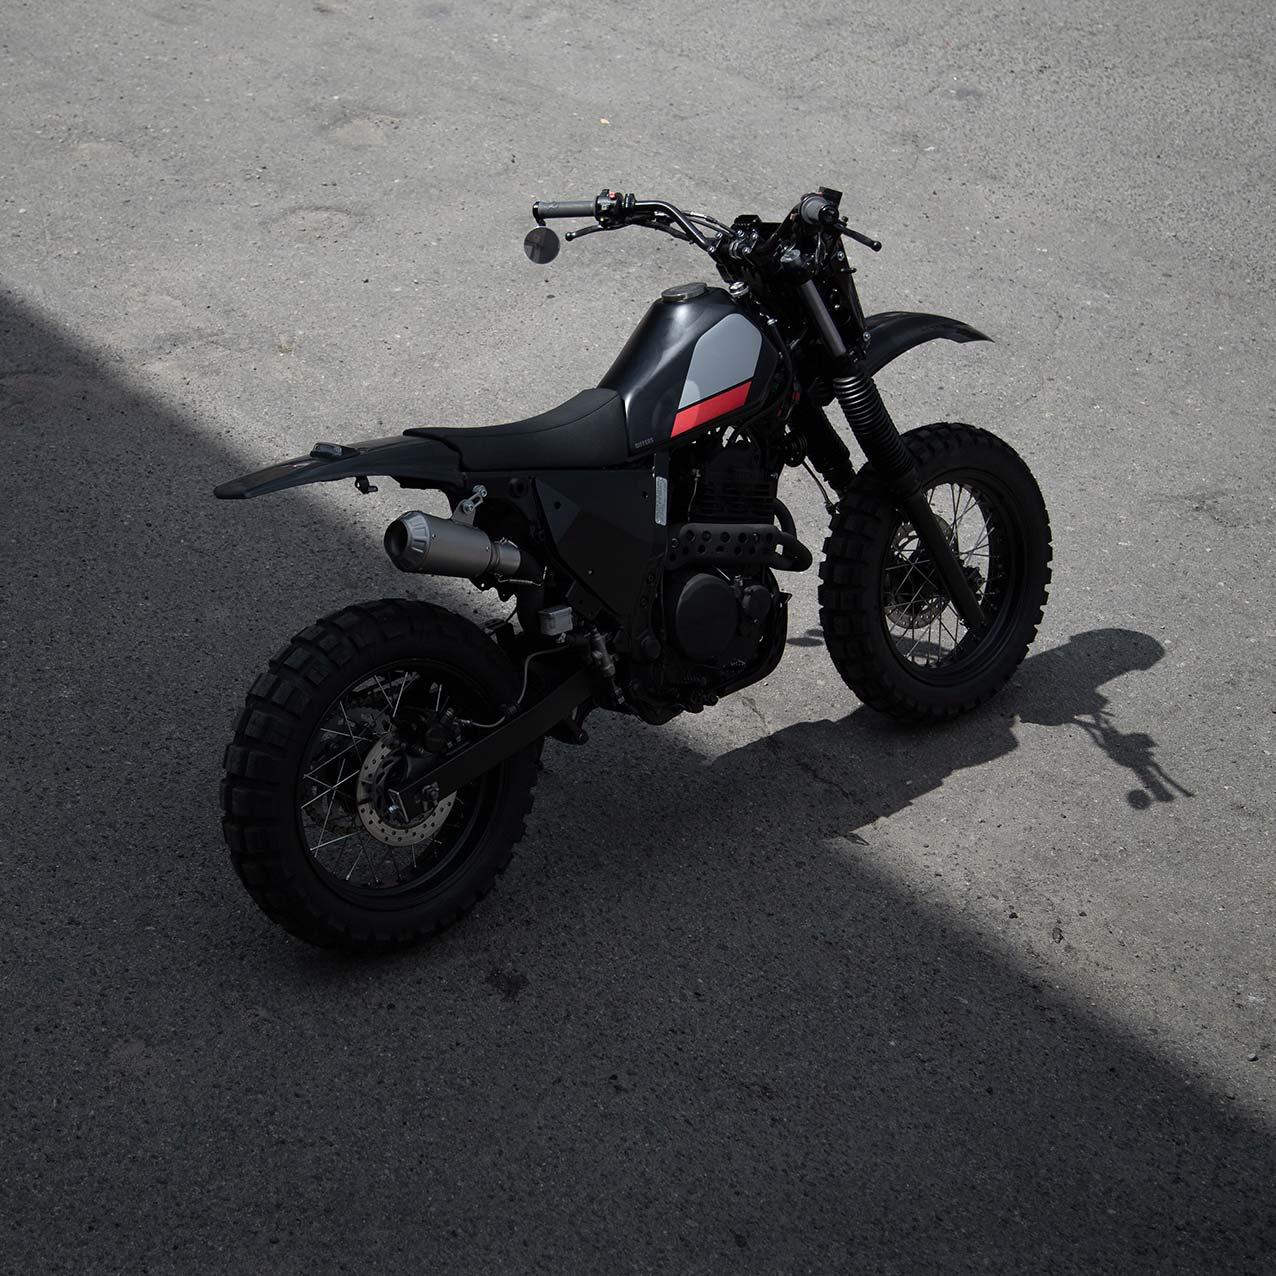 Honda NX650 Dirt Tracker/Scrambler by Differs